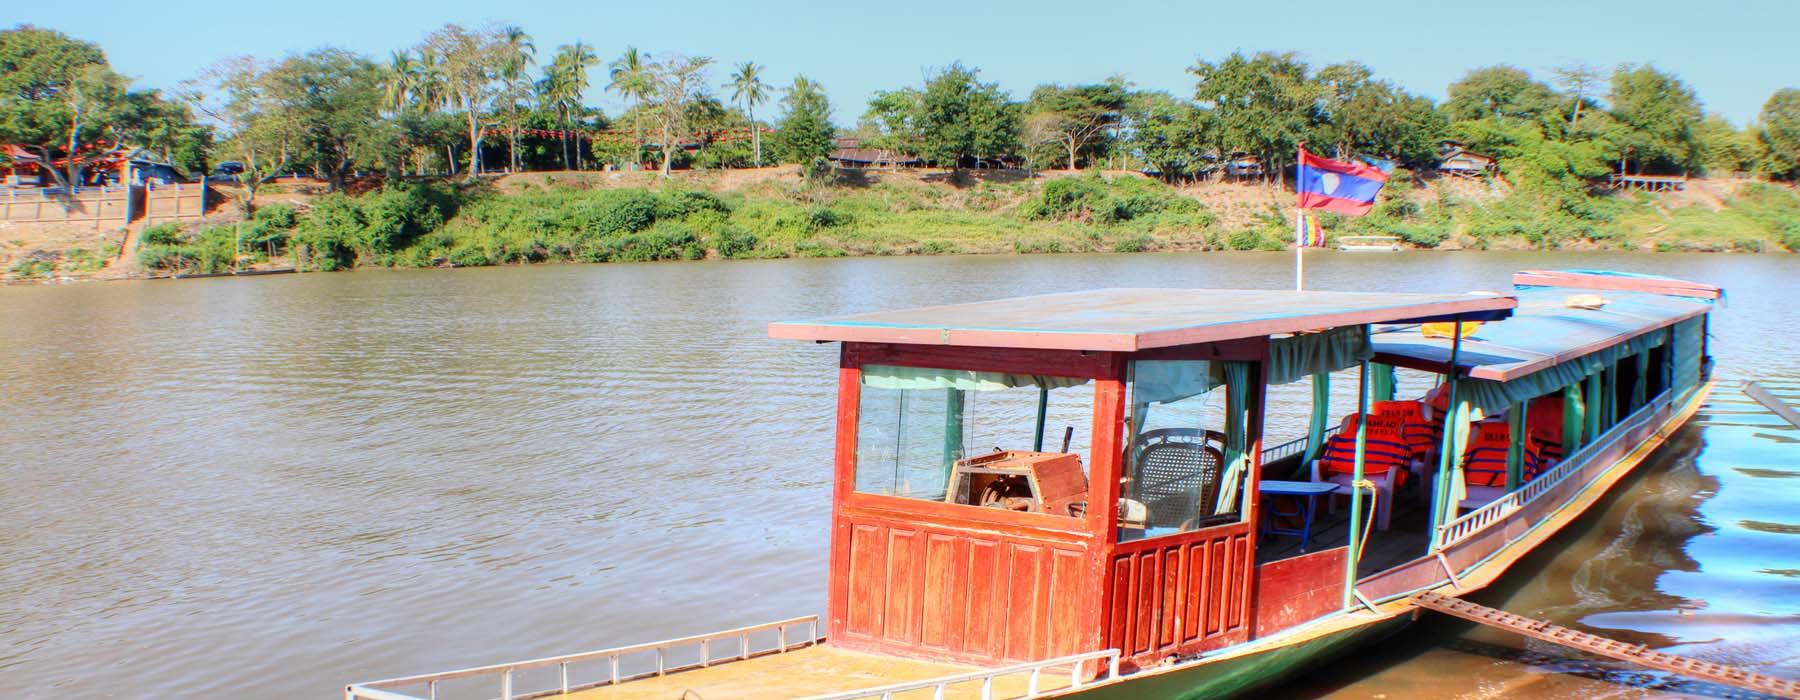 Laos-Rundreise-Reiseführer-Laos